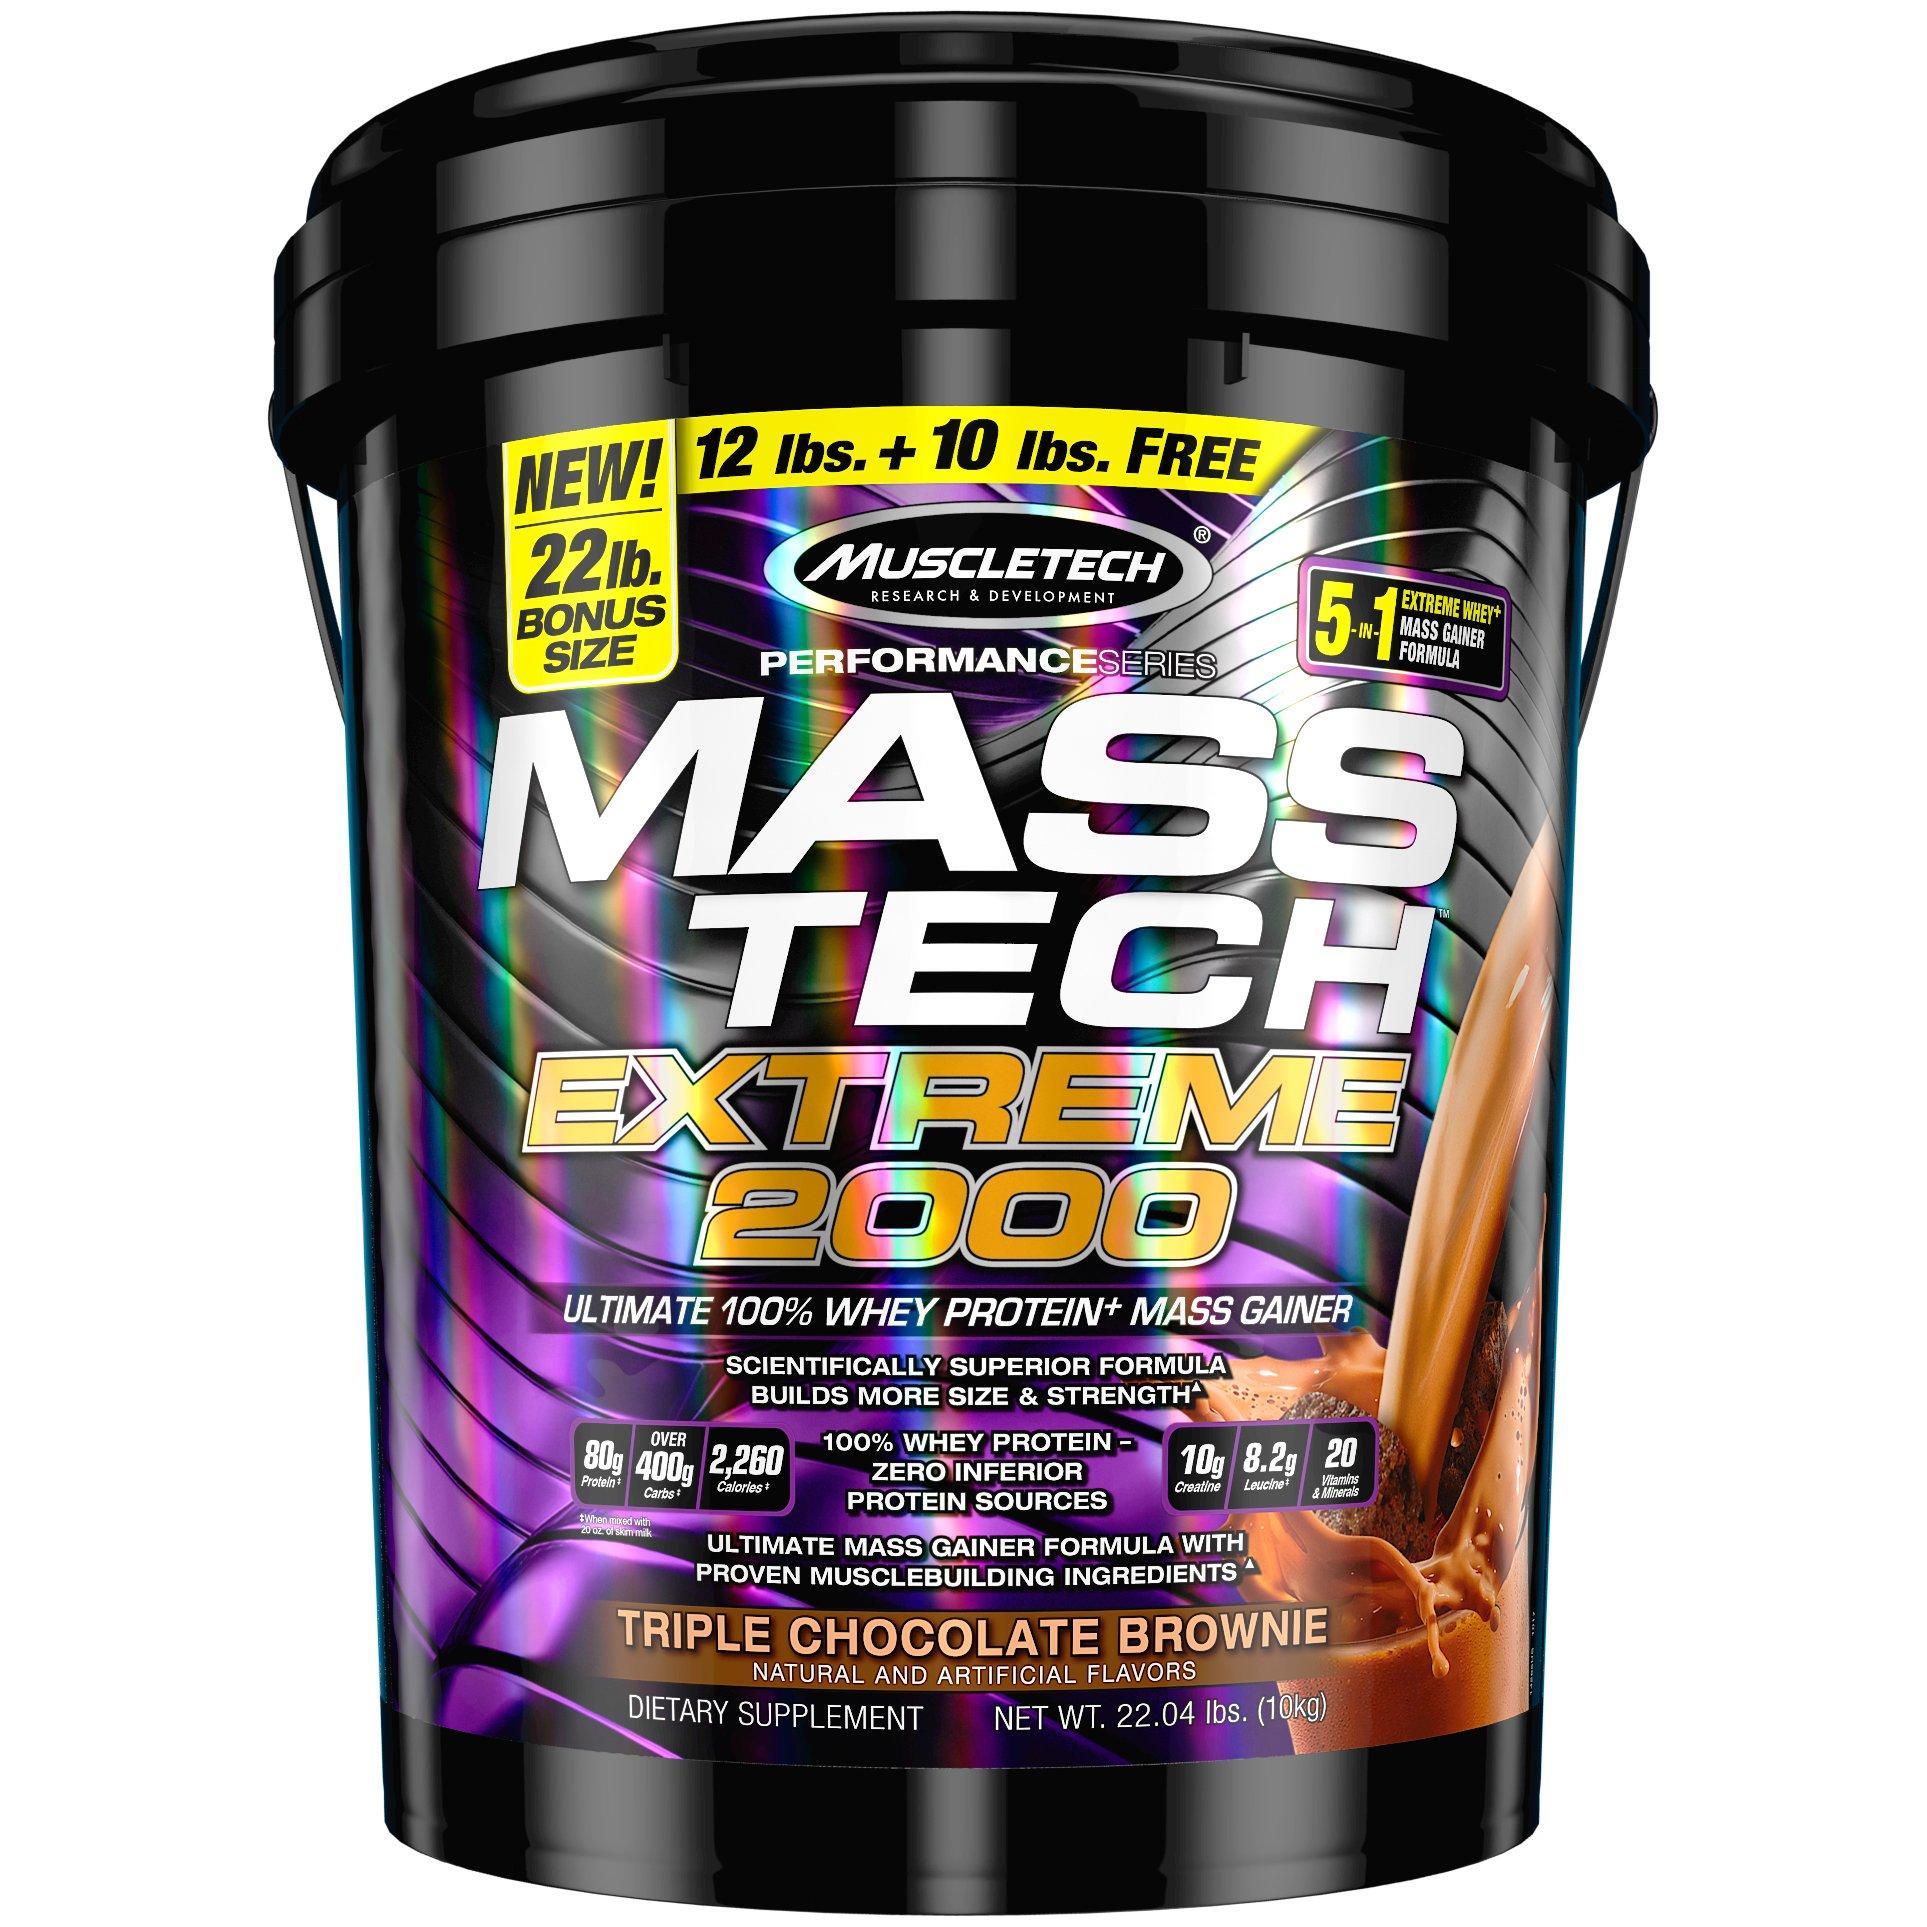 Amazon.com: MuscleTech Mass Tech Extreme Weight Gainer Protein Powder, Vanilla Milkshake, 22lbs